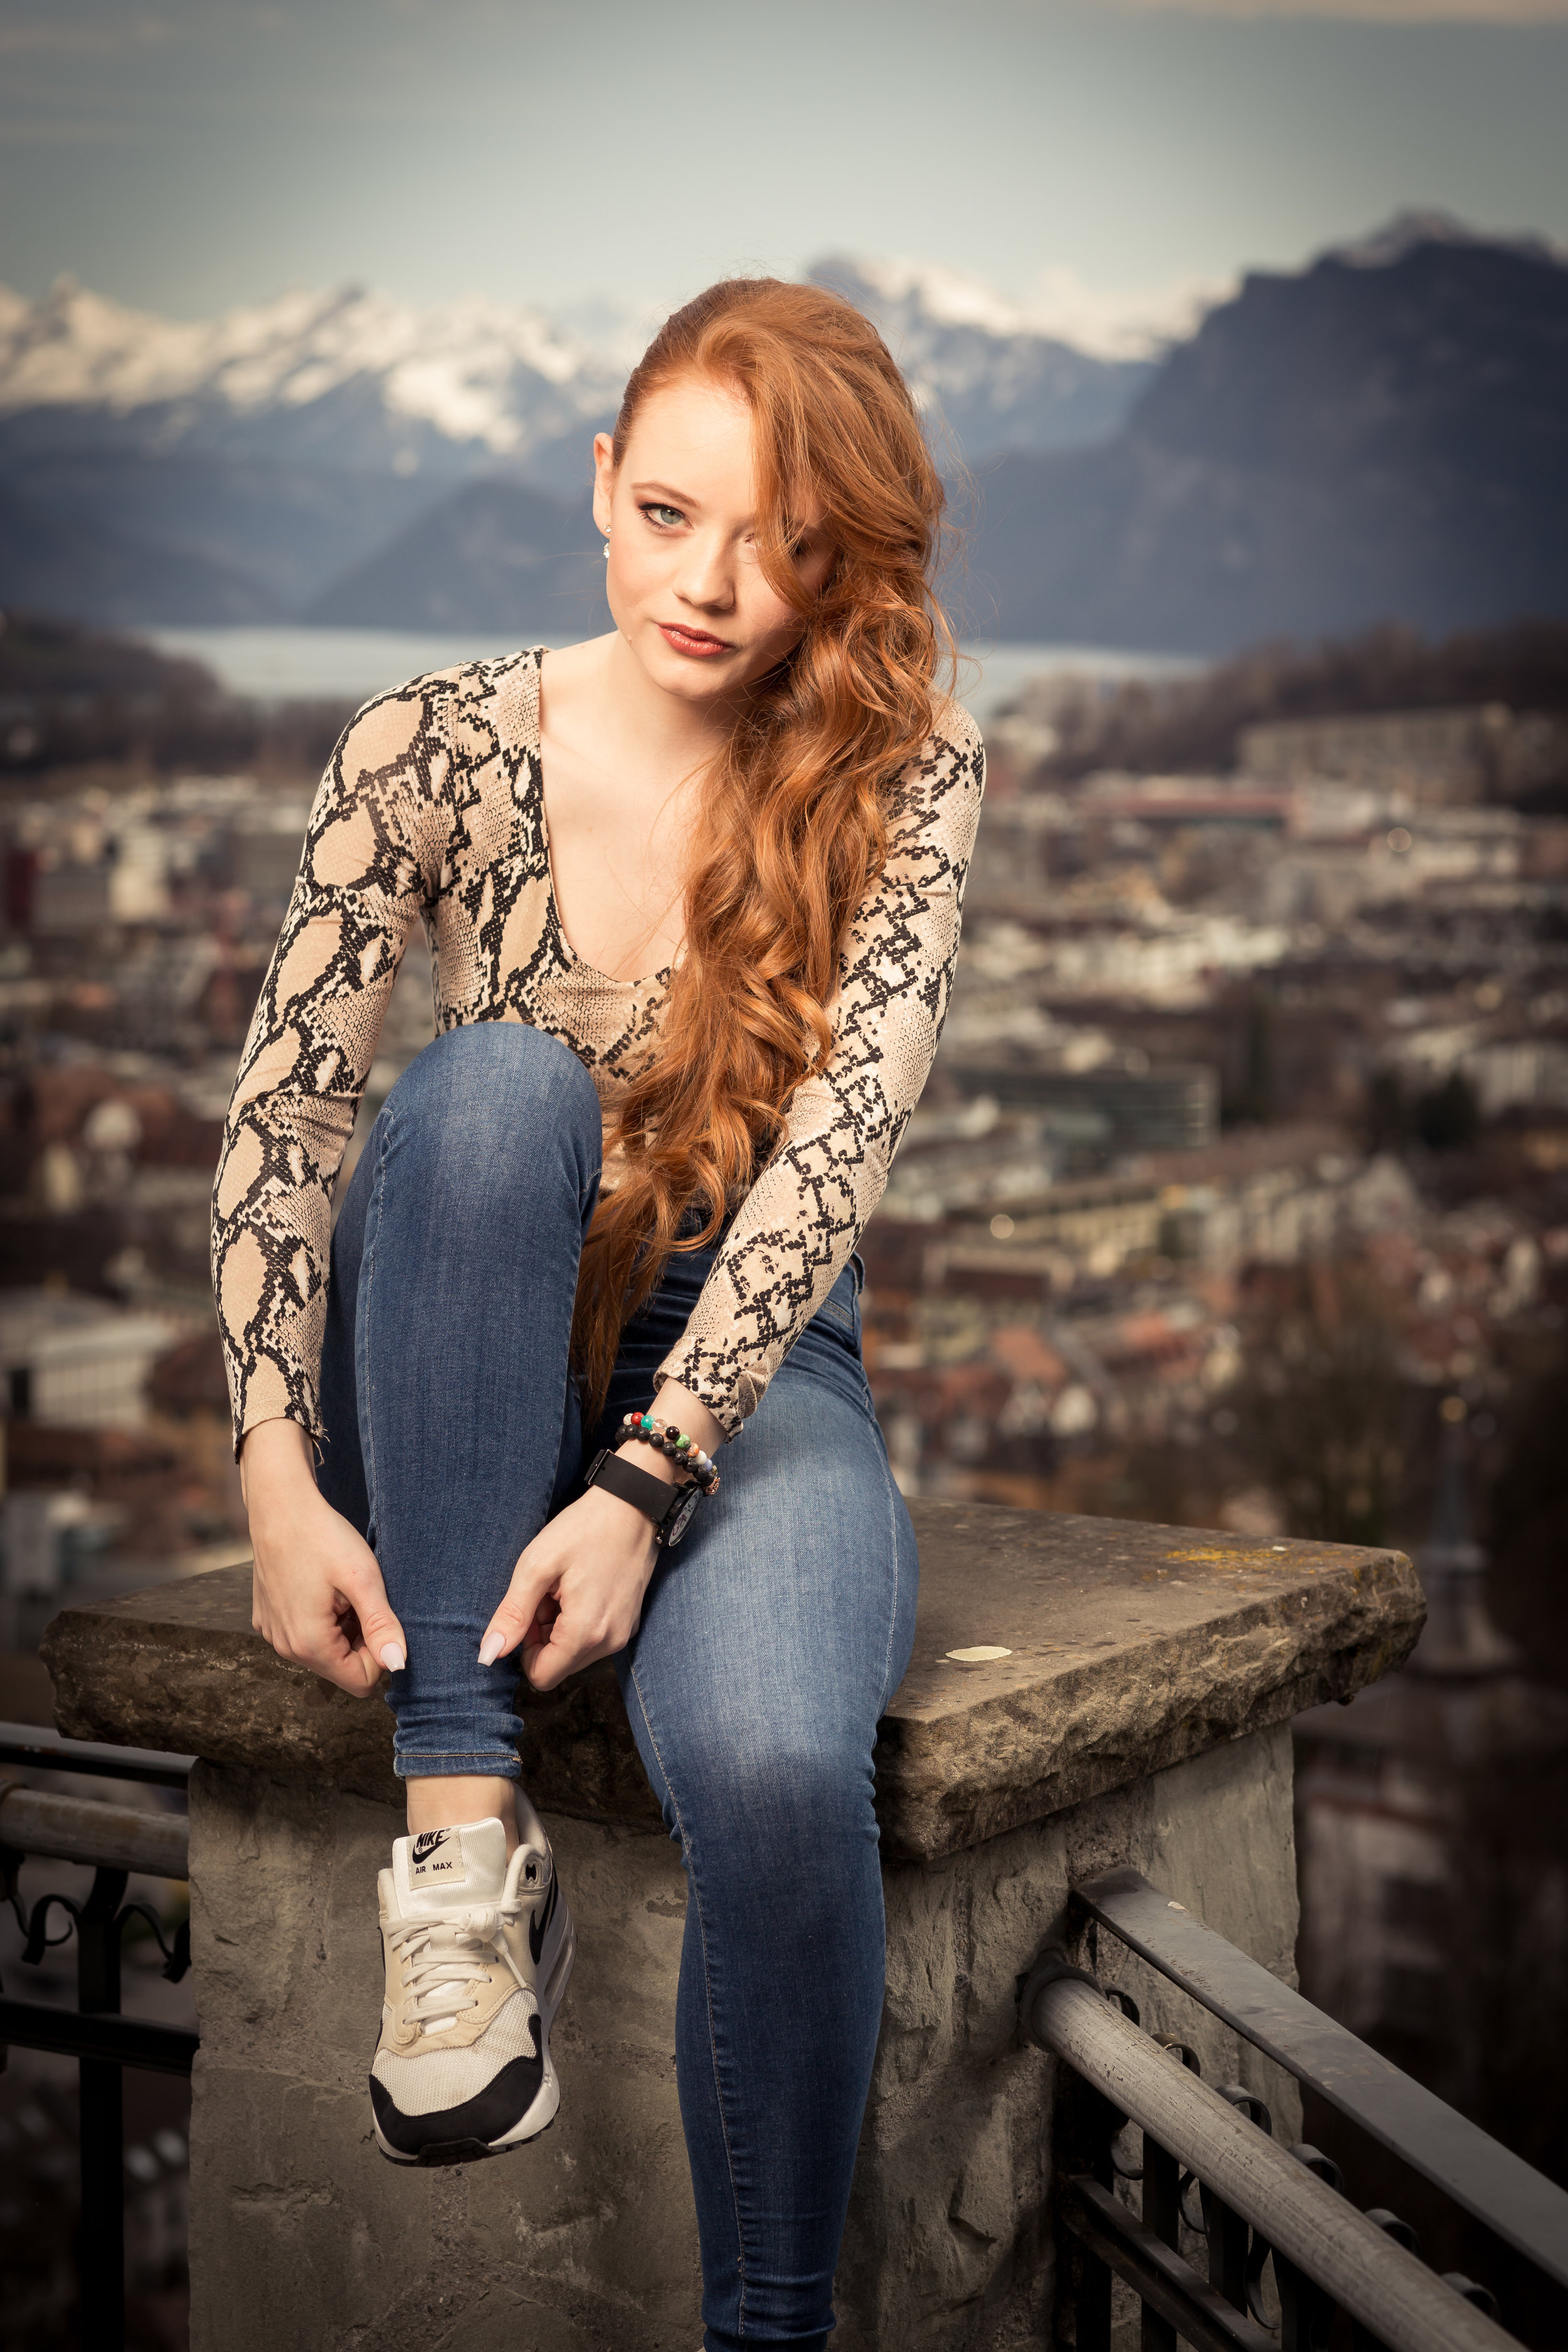 Miss Zentralschweiz, marcoherzig.com-1.jpg